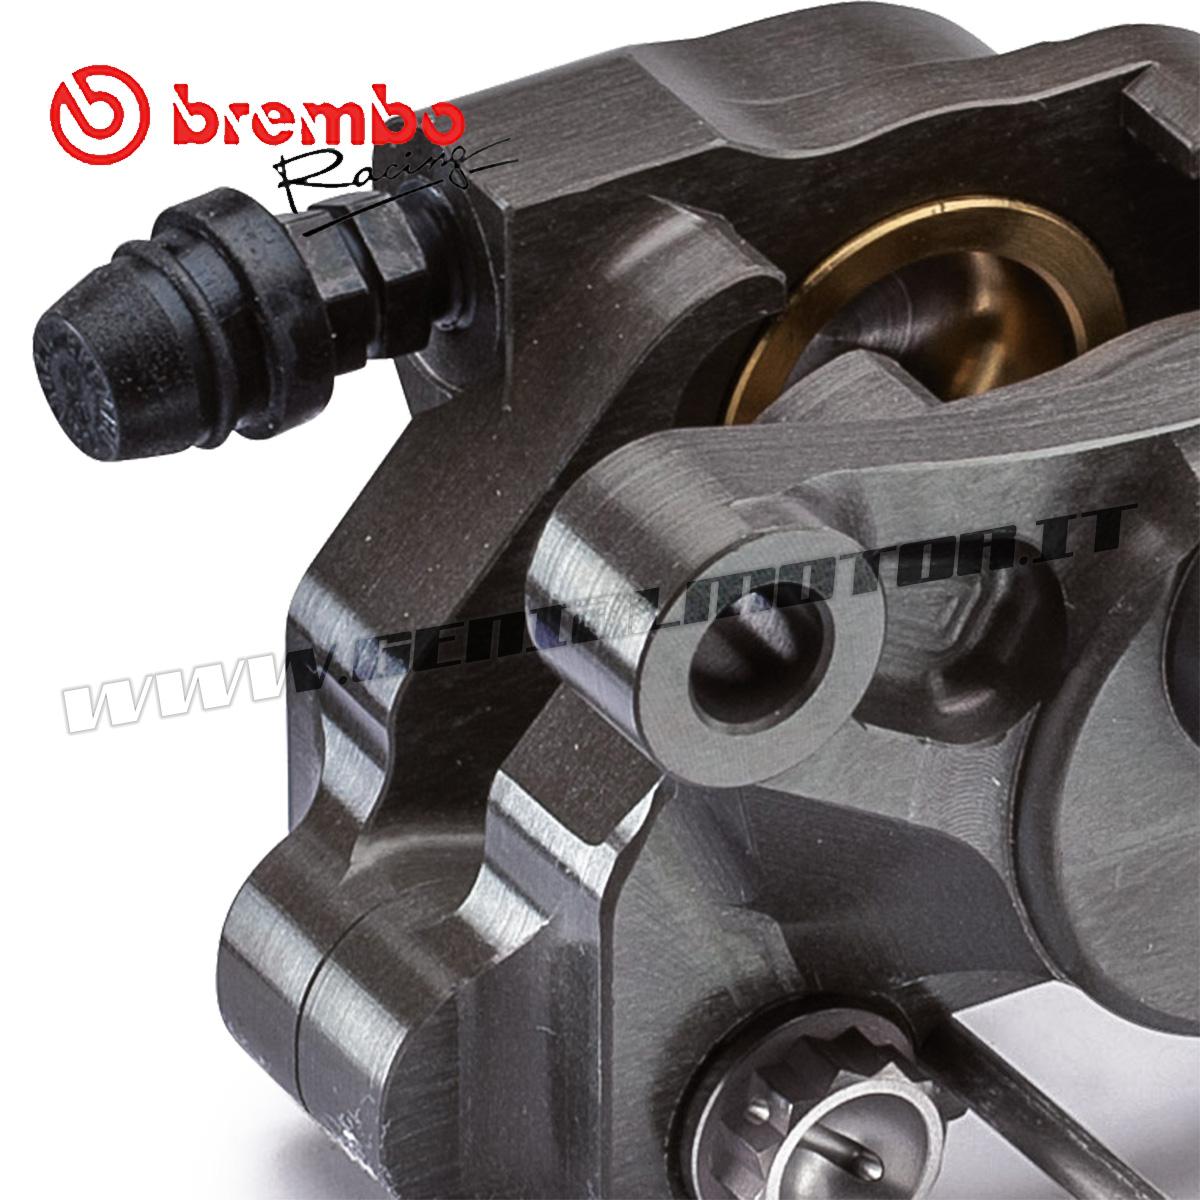 XA80810 Calipers Rear Break Brembo Racing P2 24 Without Pad